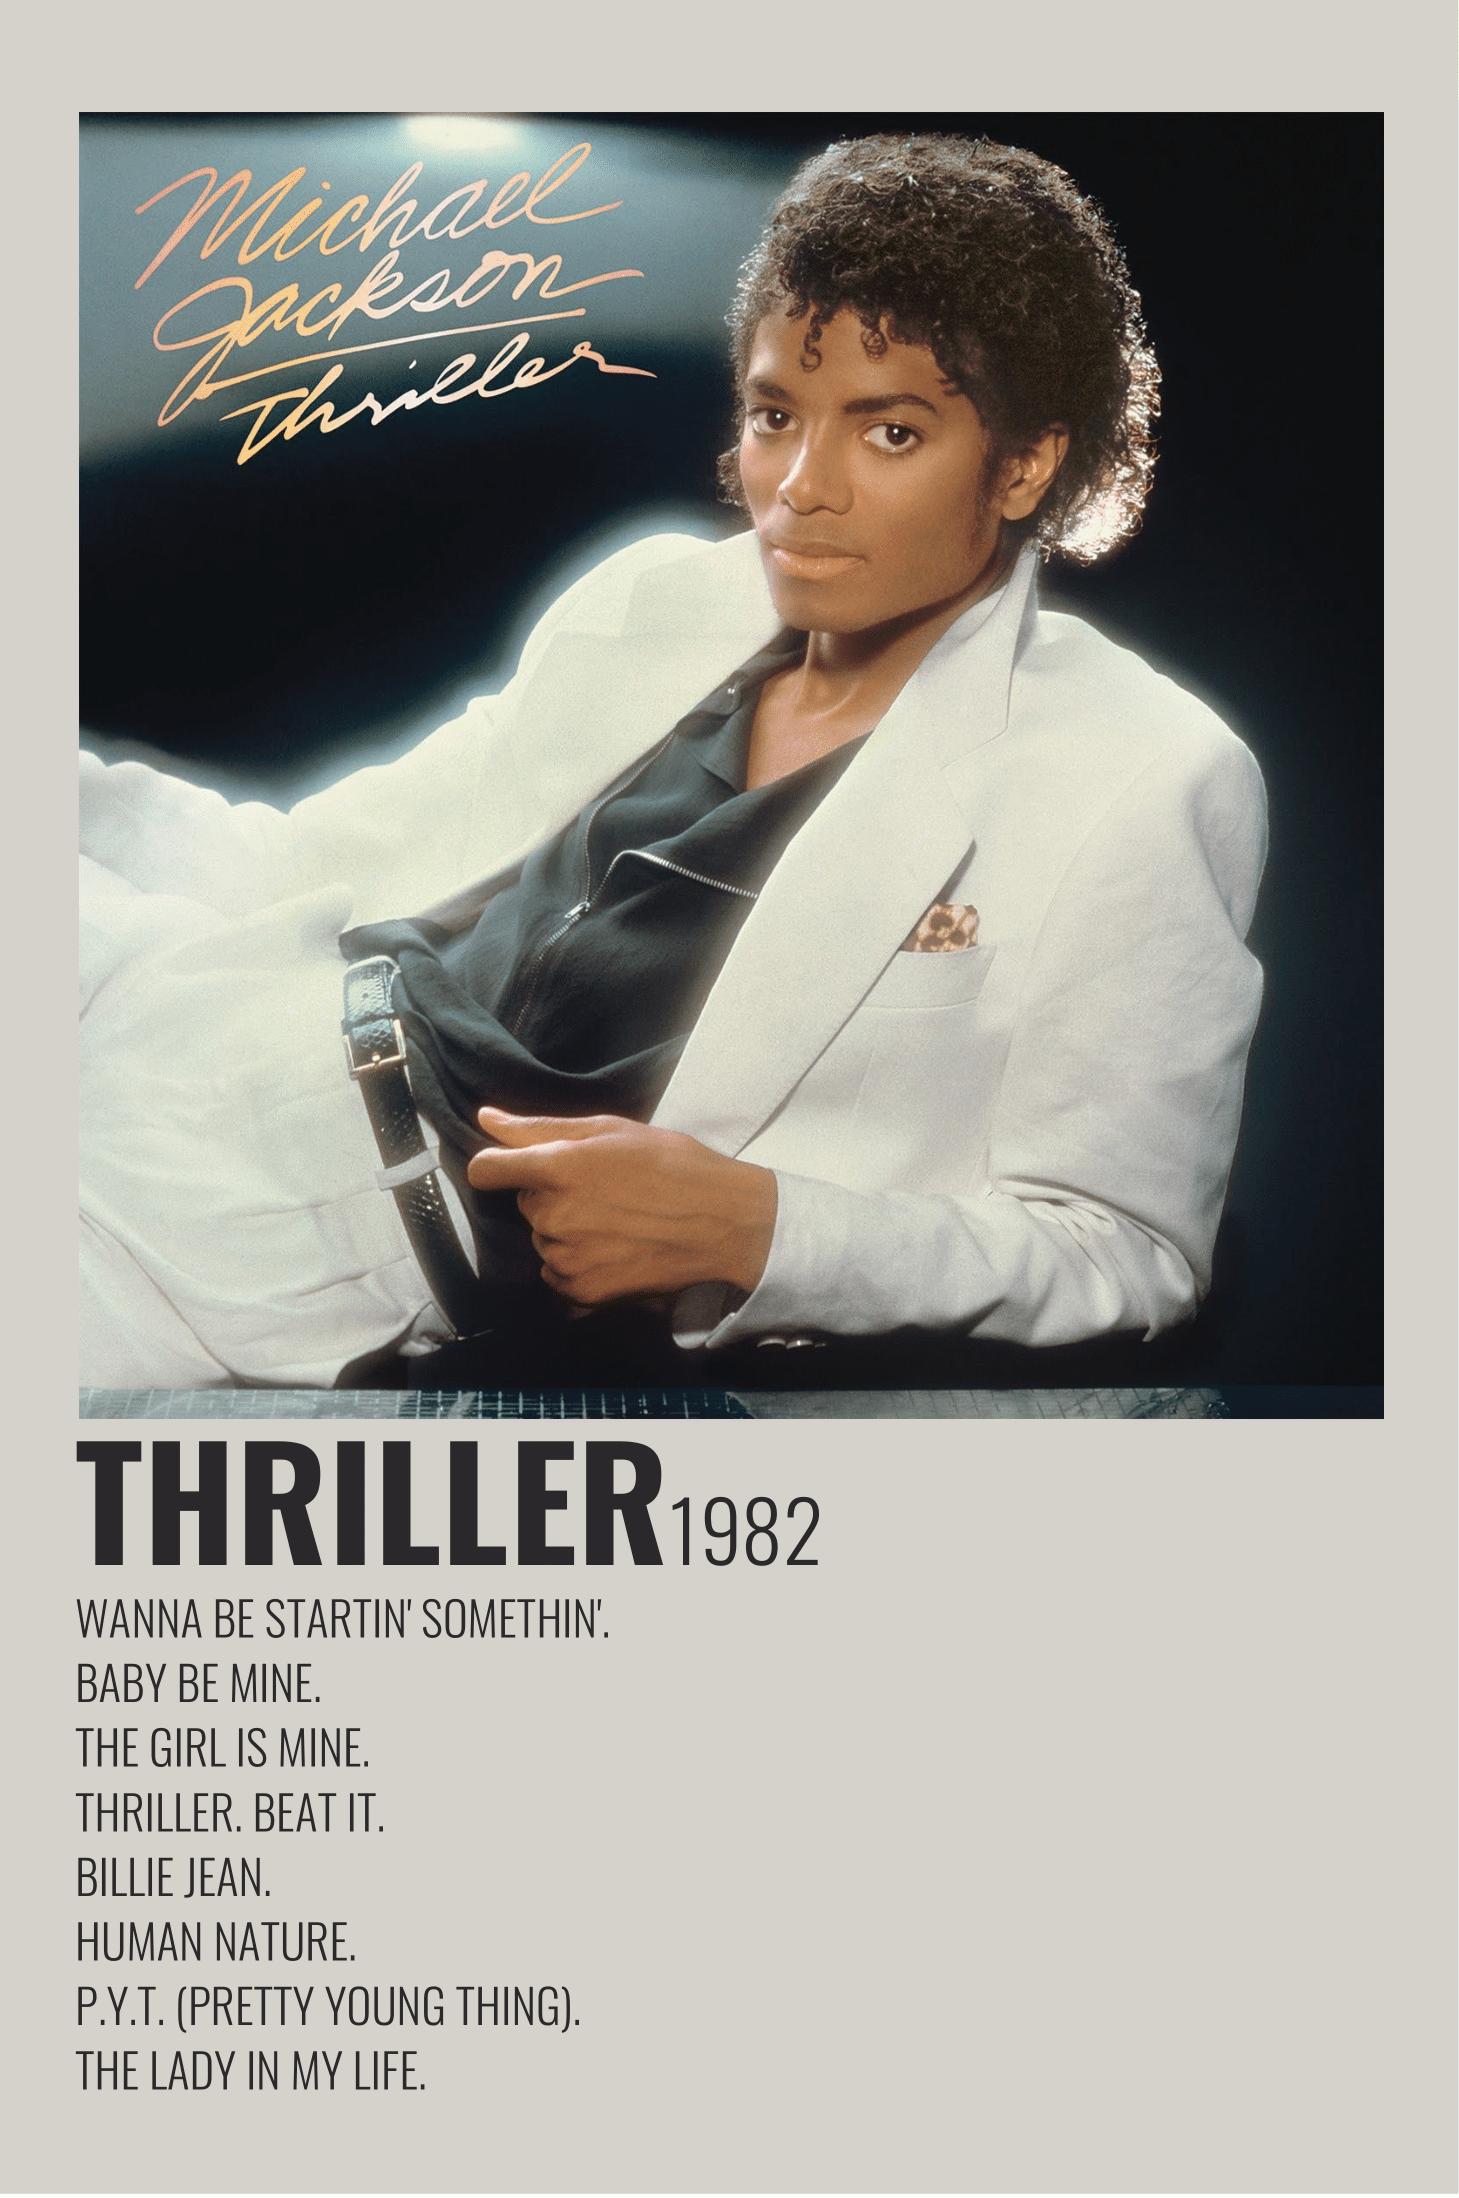 Thriller By Michael Jackson Album Wall Art Minimalist Music Music Album Cover Michael Jackson Poster